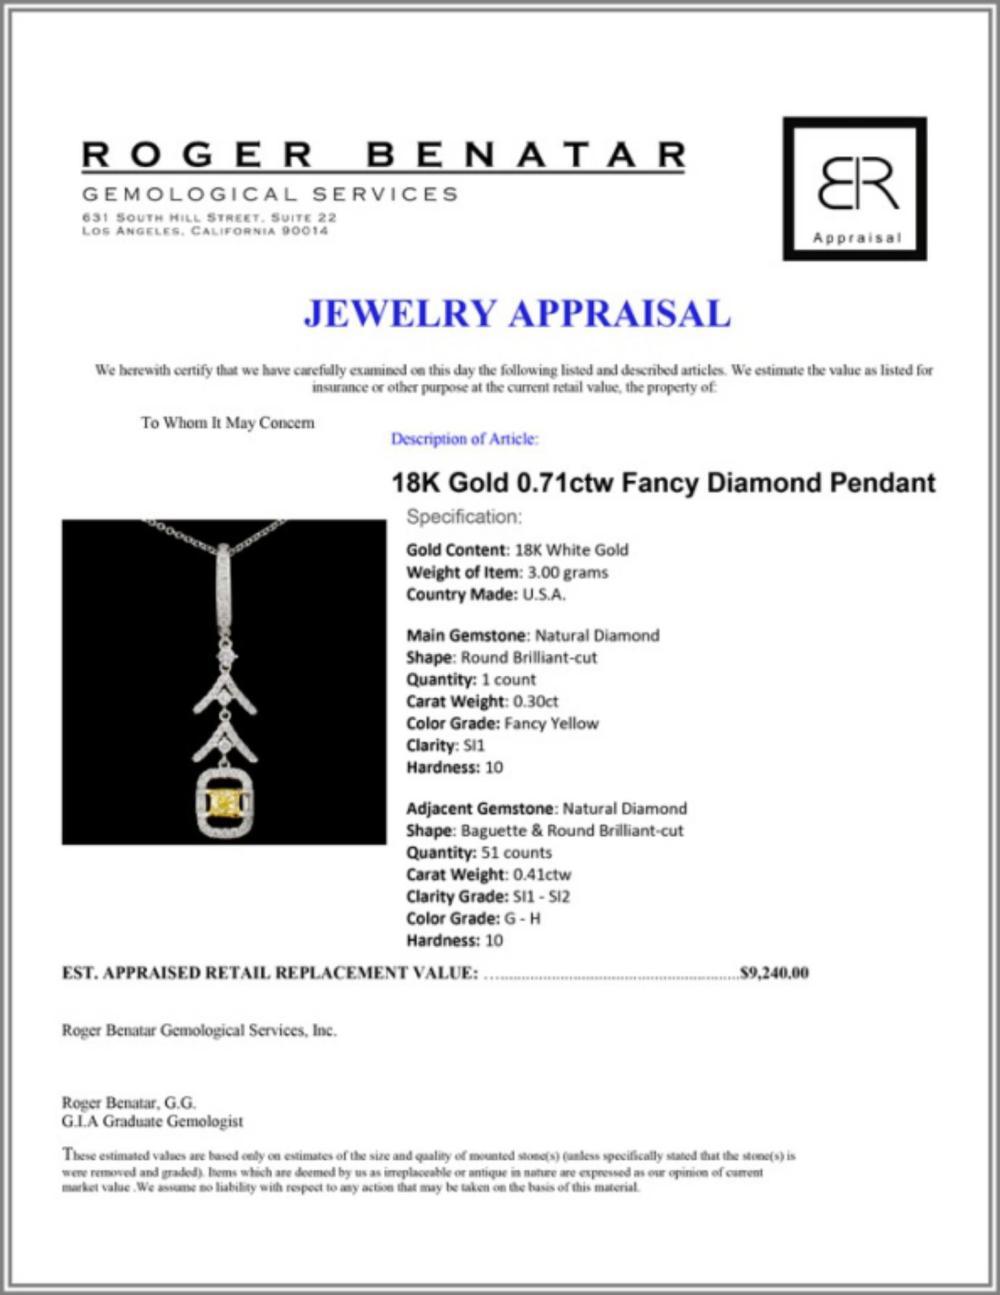 Lot 54: 18K Gold 0.71ctw Fancy Diamond Pendant